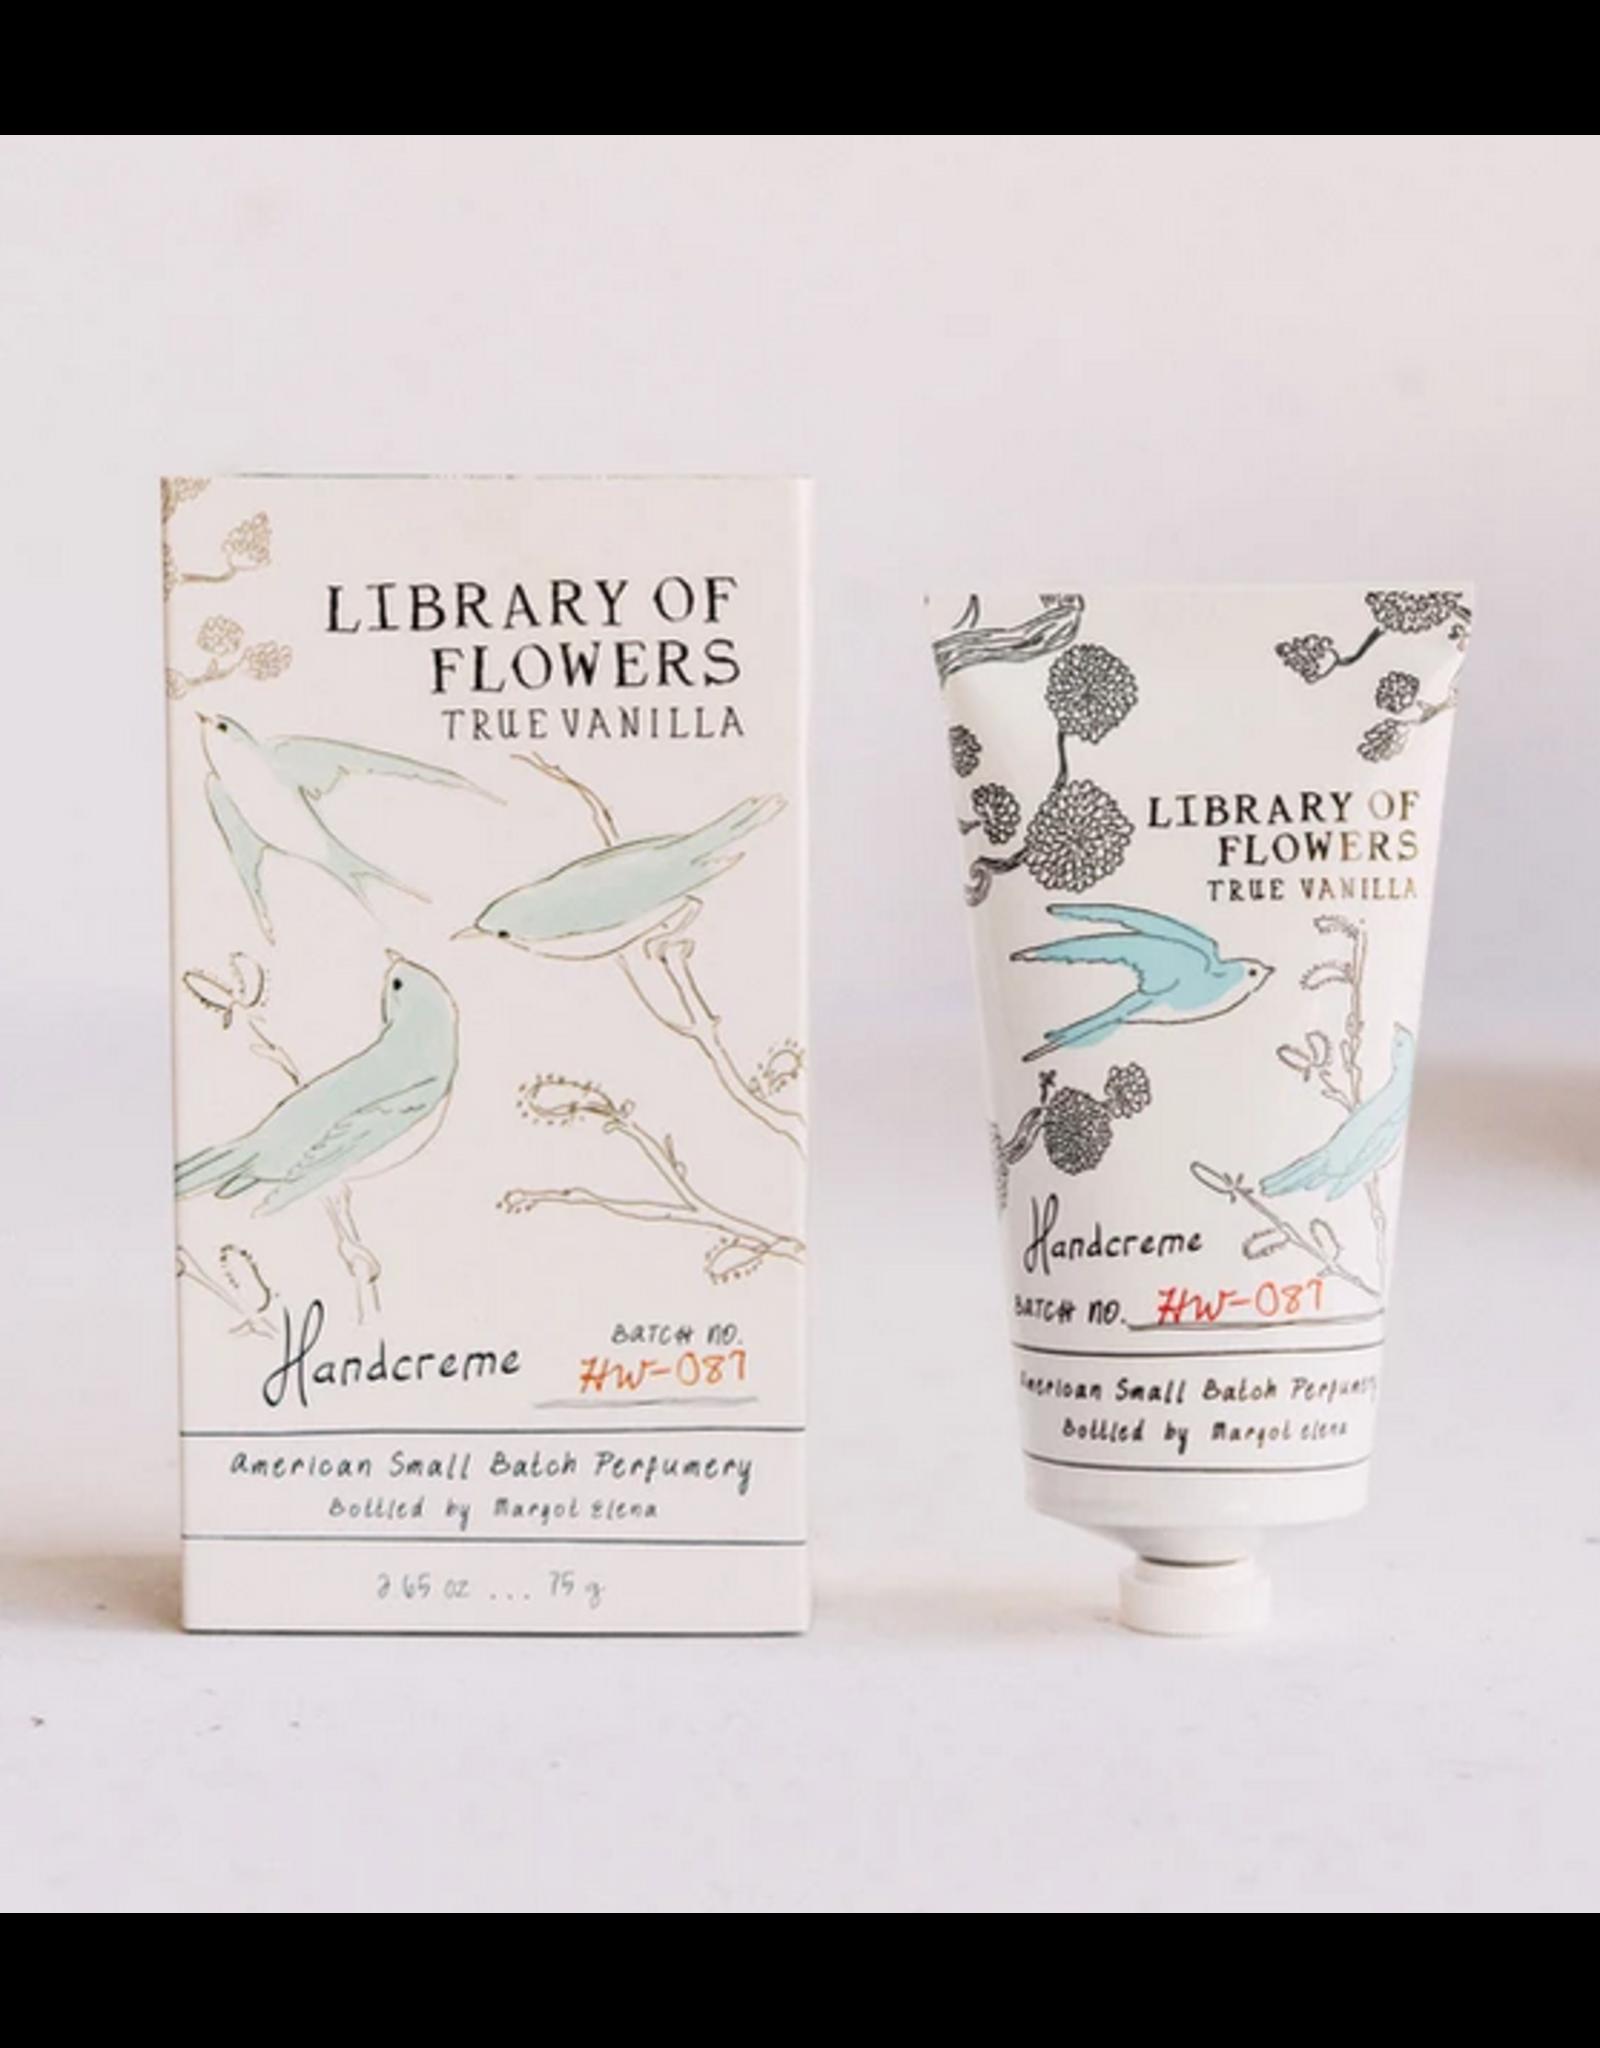 Library of Flowers True Vanilla Handcreme